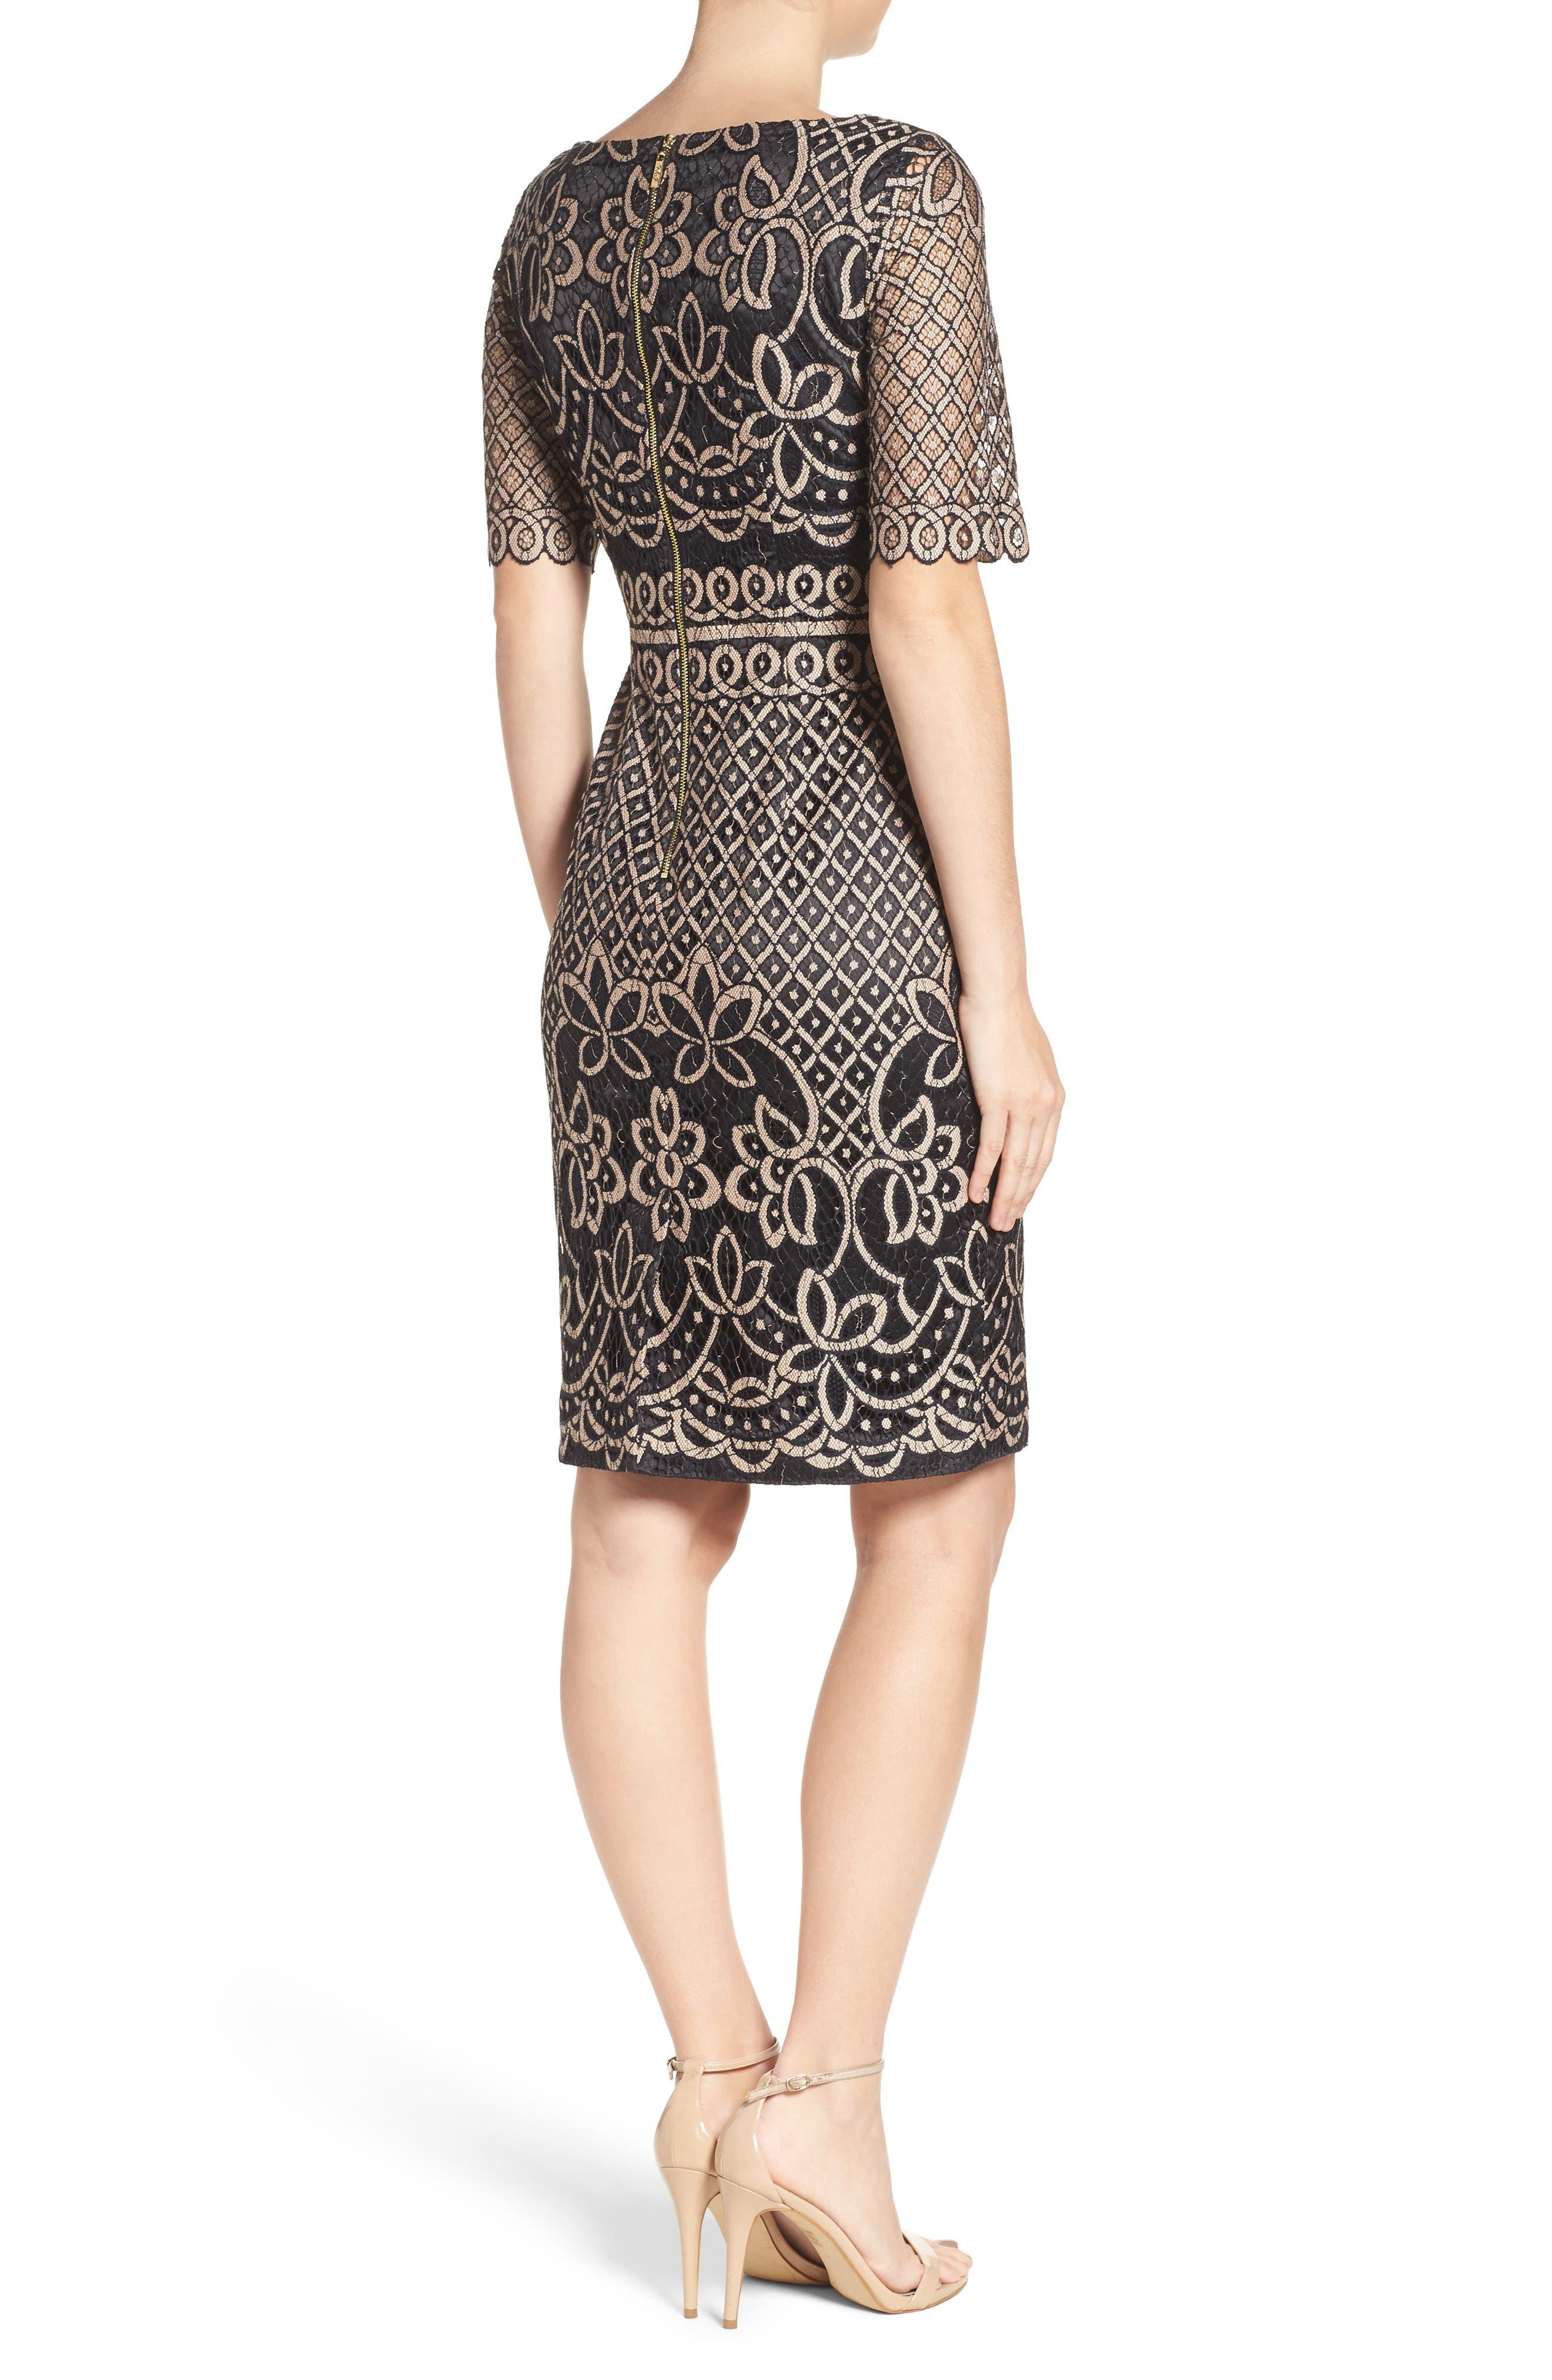 ELIZA J, Lace Sheath Dress, Alternate thumbnail 2, color, 009